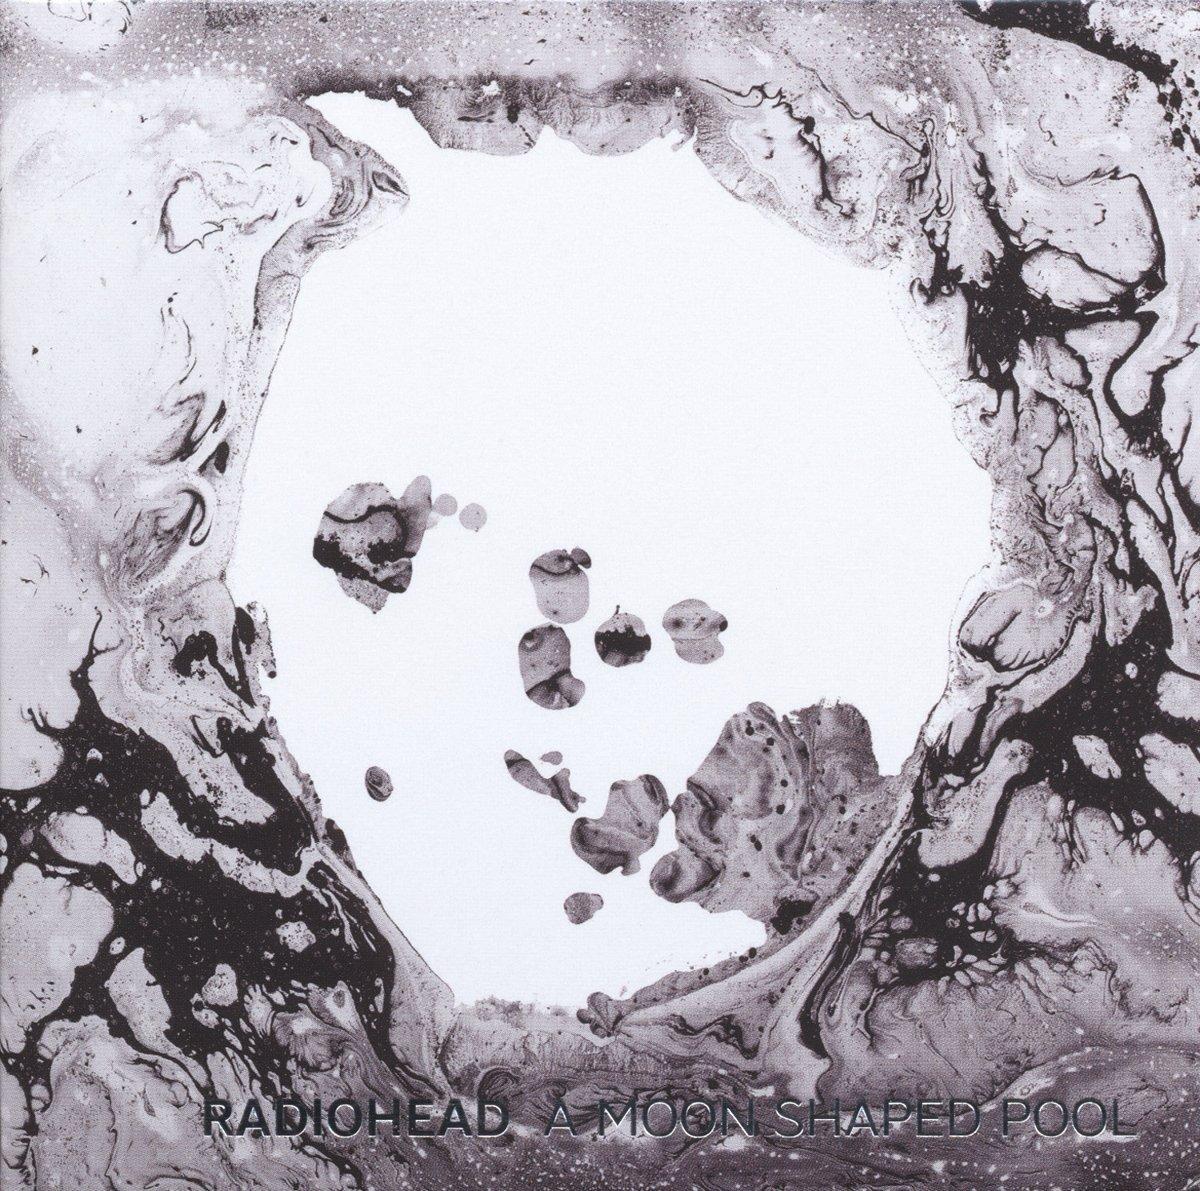 A Moon Shaped Pool, Radiohead